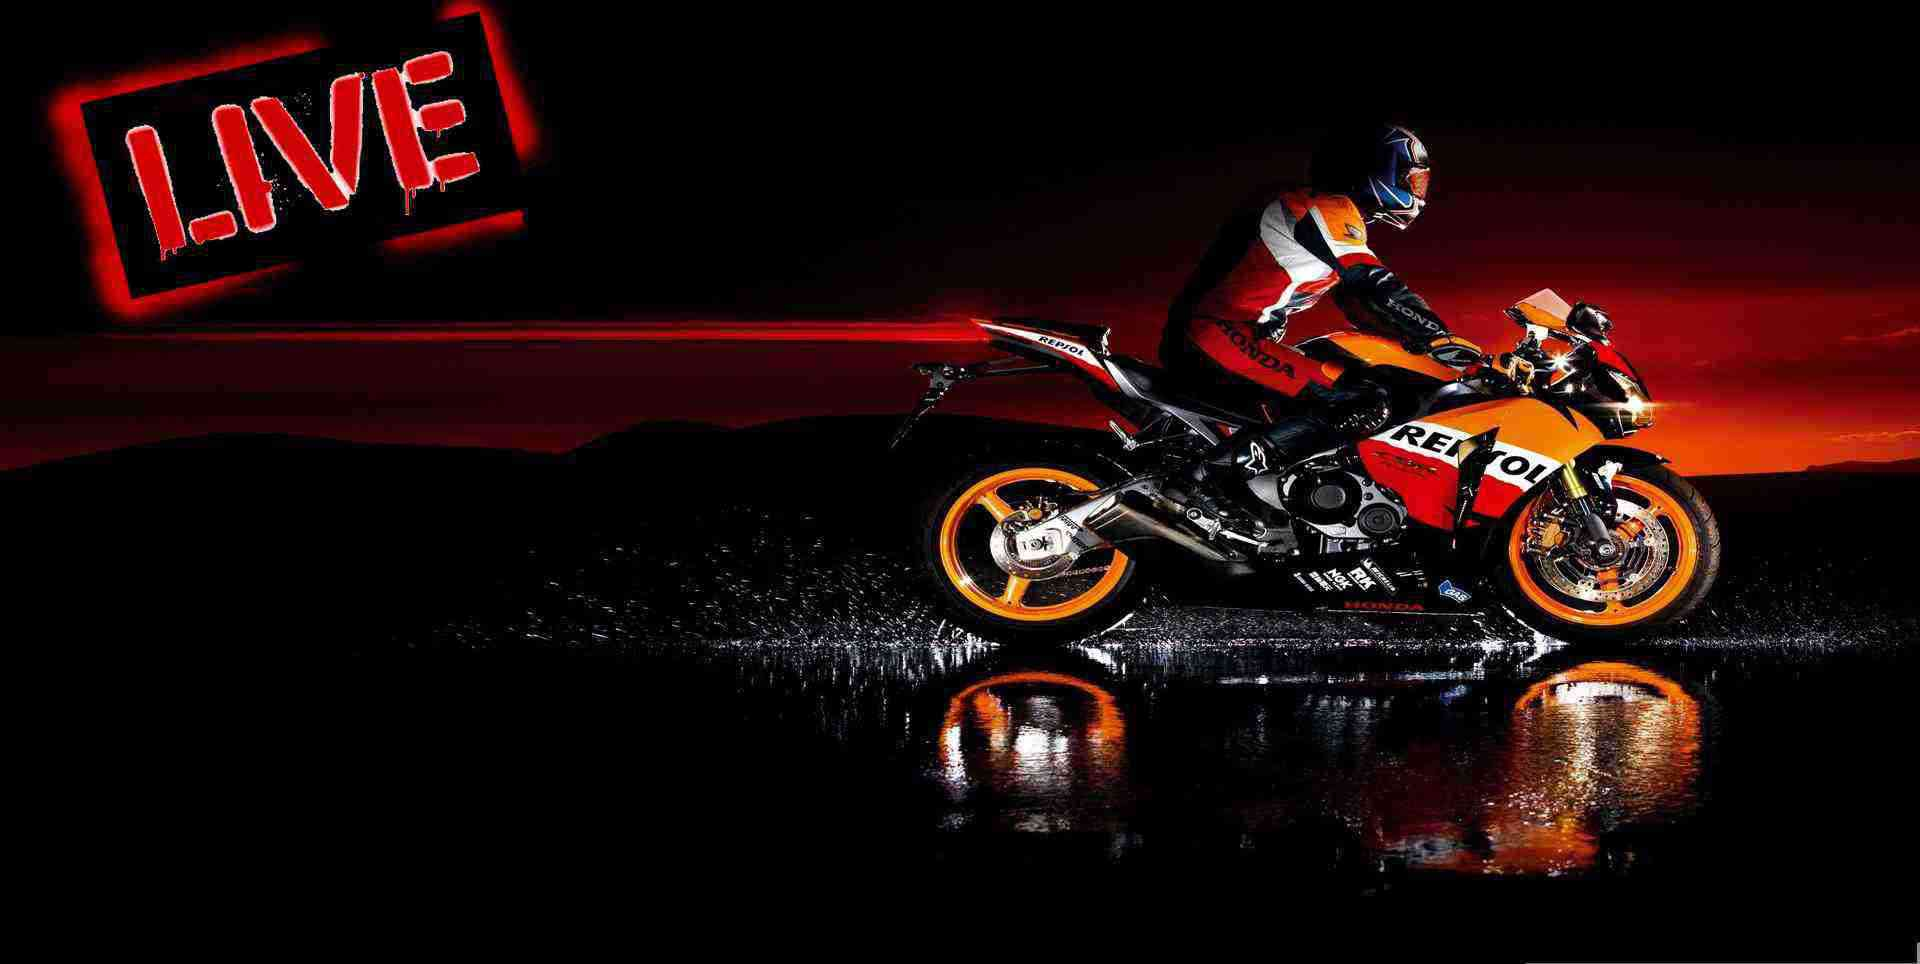 live-online-2017-motogp-italian-grand-prix